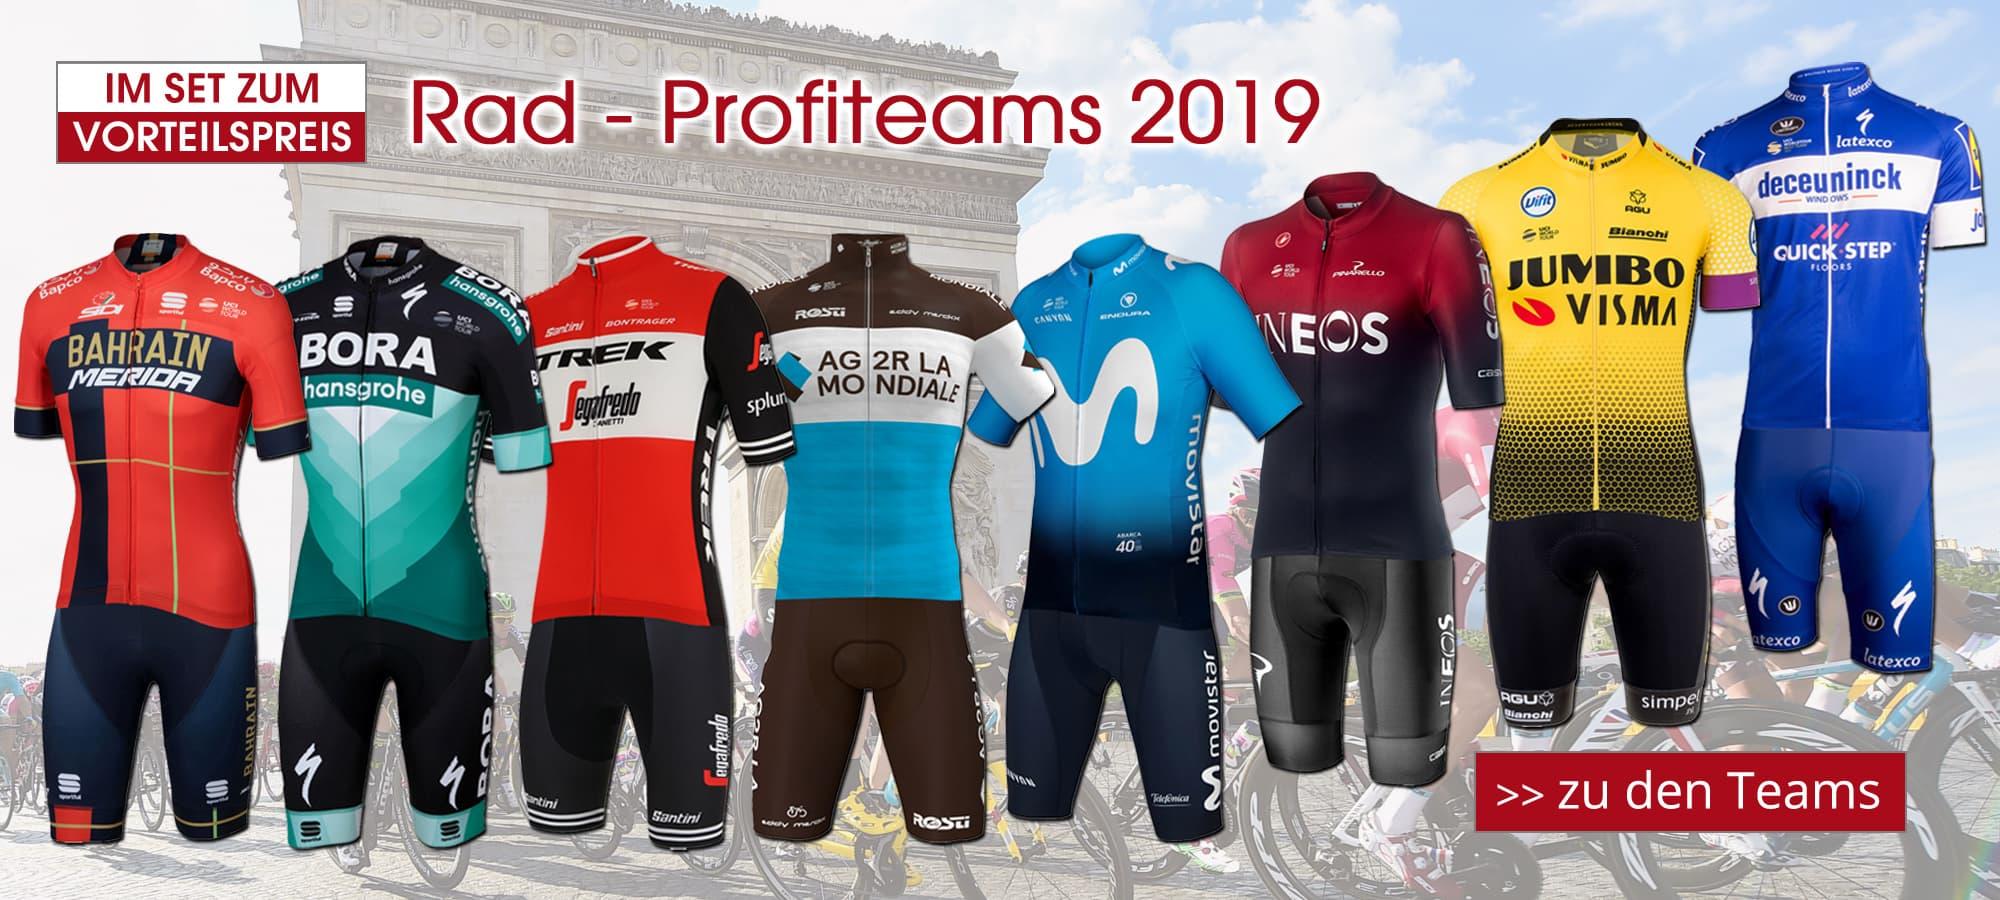 876d40dc95132 Castelli - Die neue Kollektion 2019  Rad - Profiteams 2019 ...